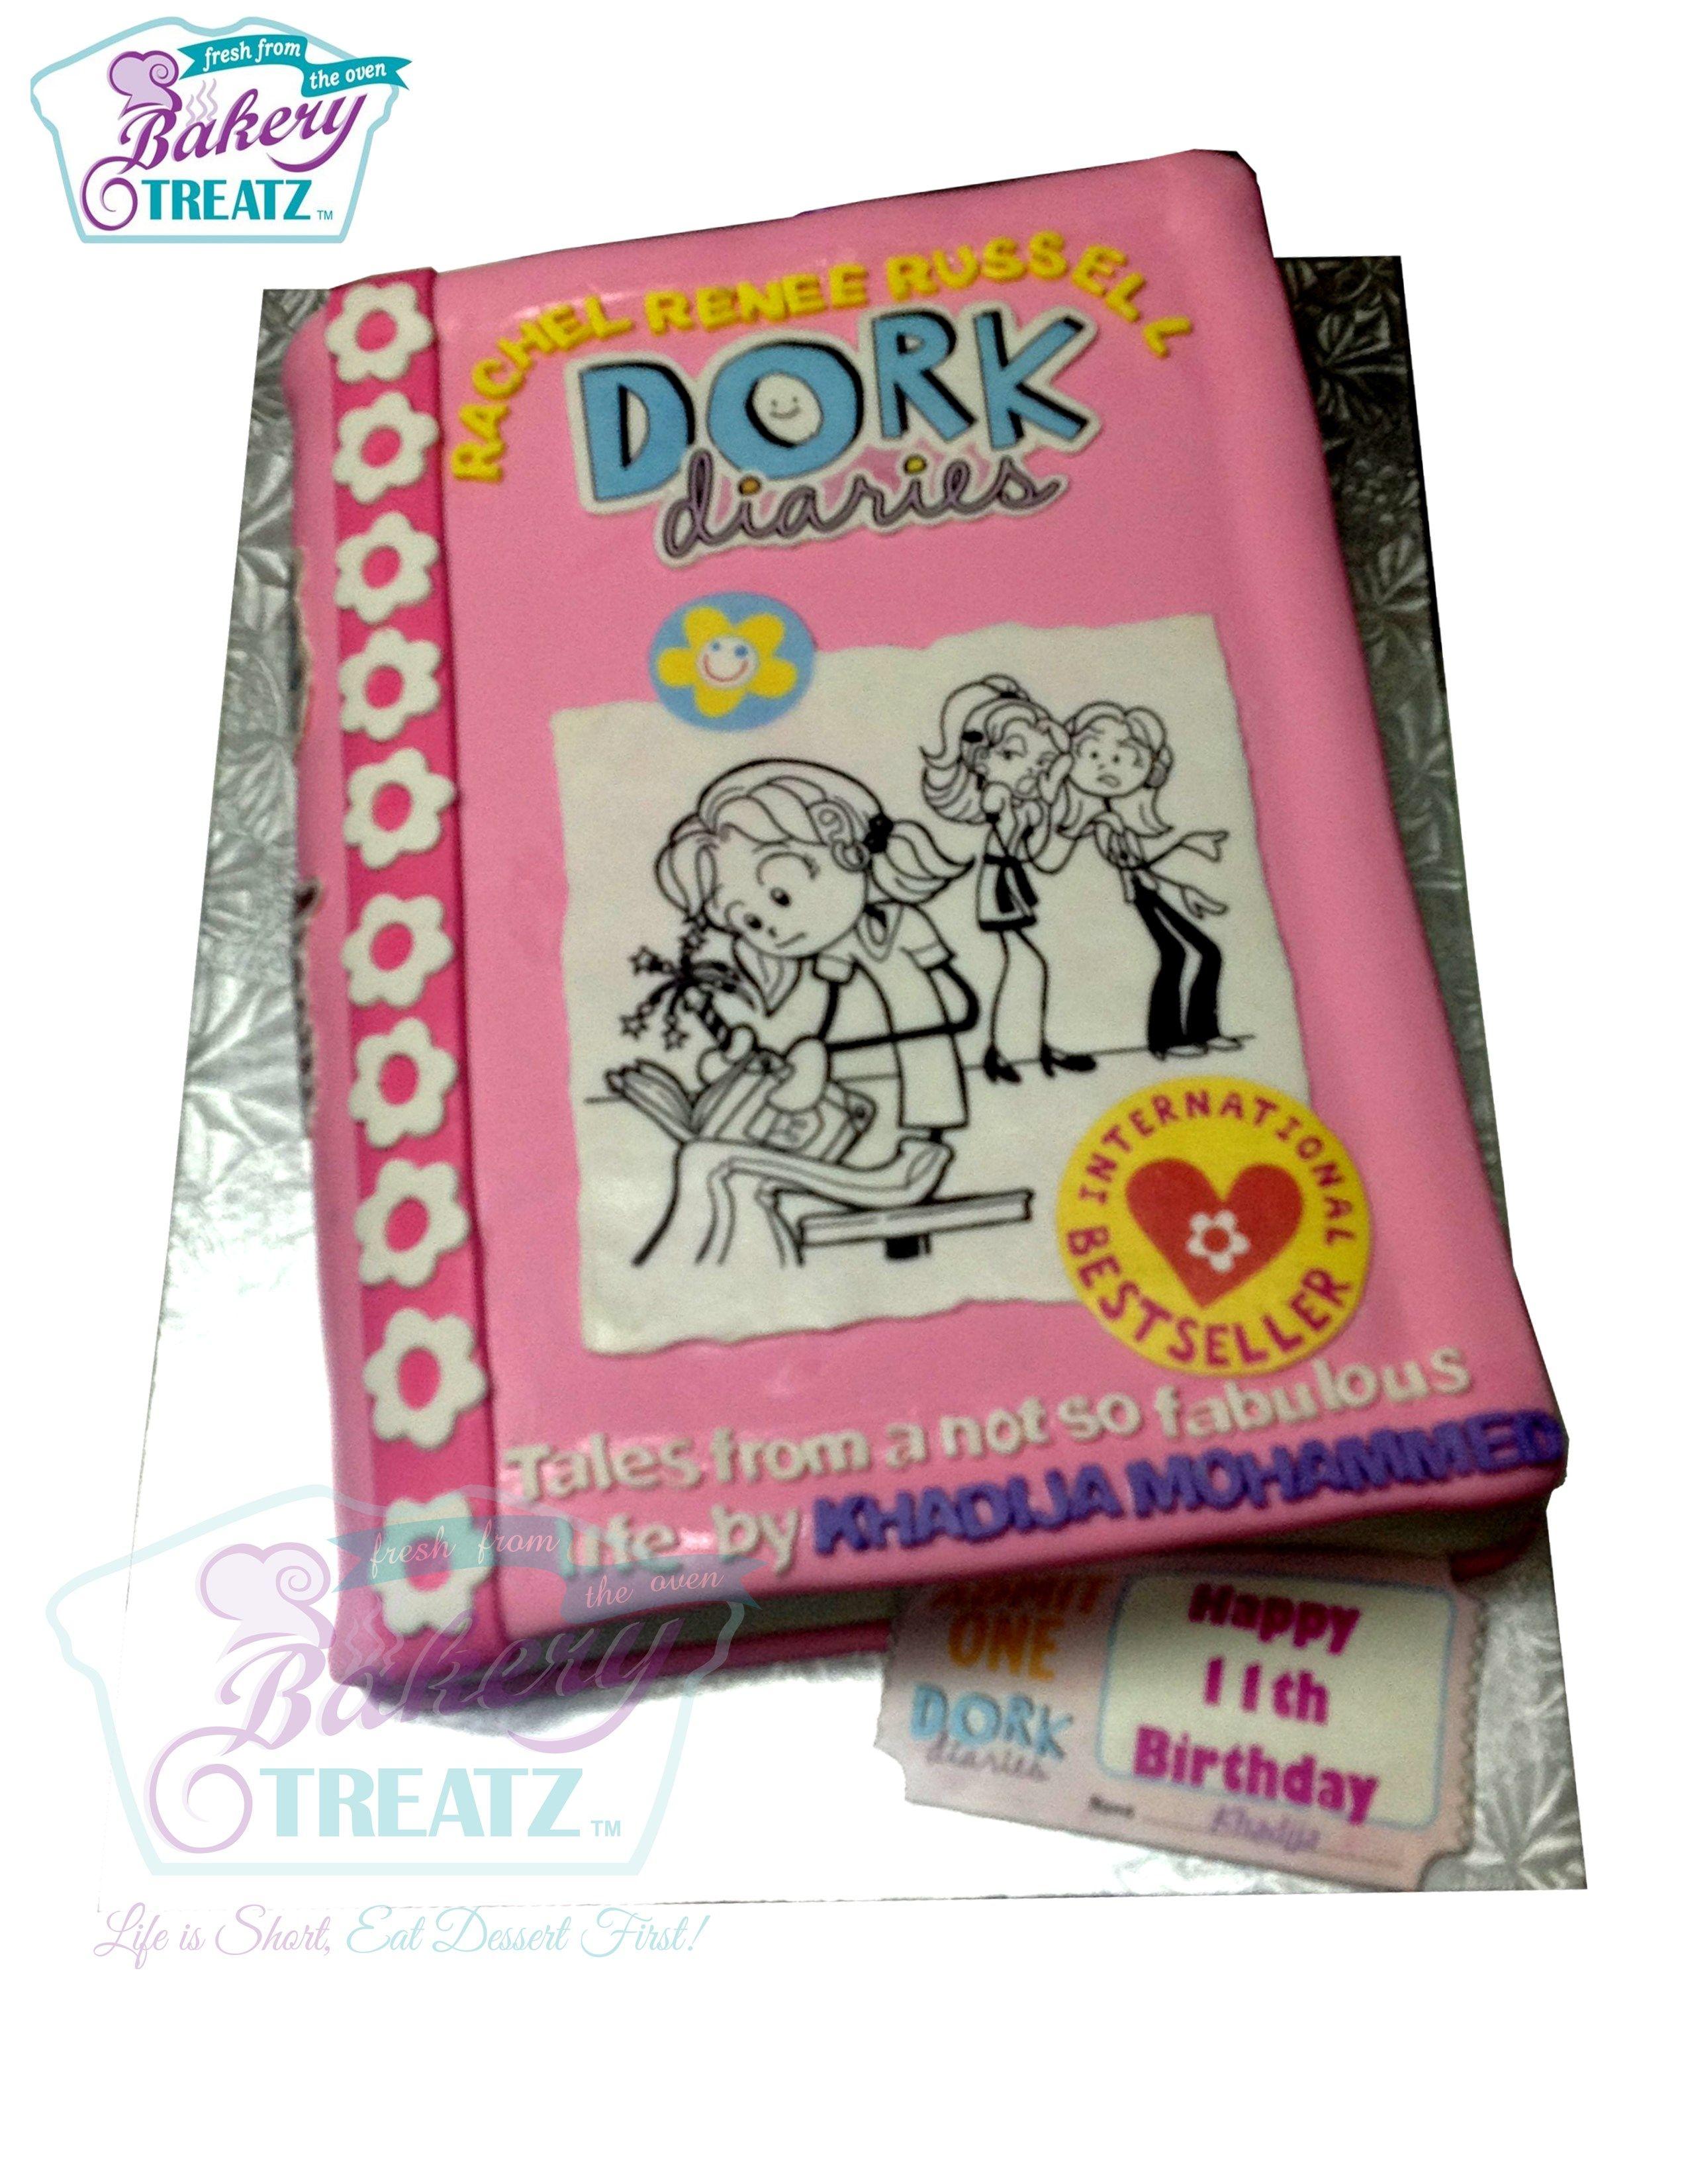 Dork diaries book cake | Cakes in 2019 | Dork diaries books